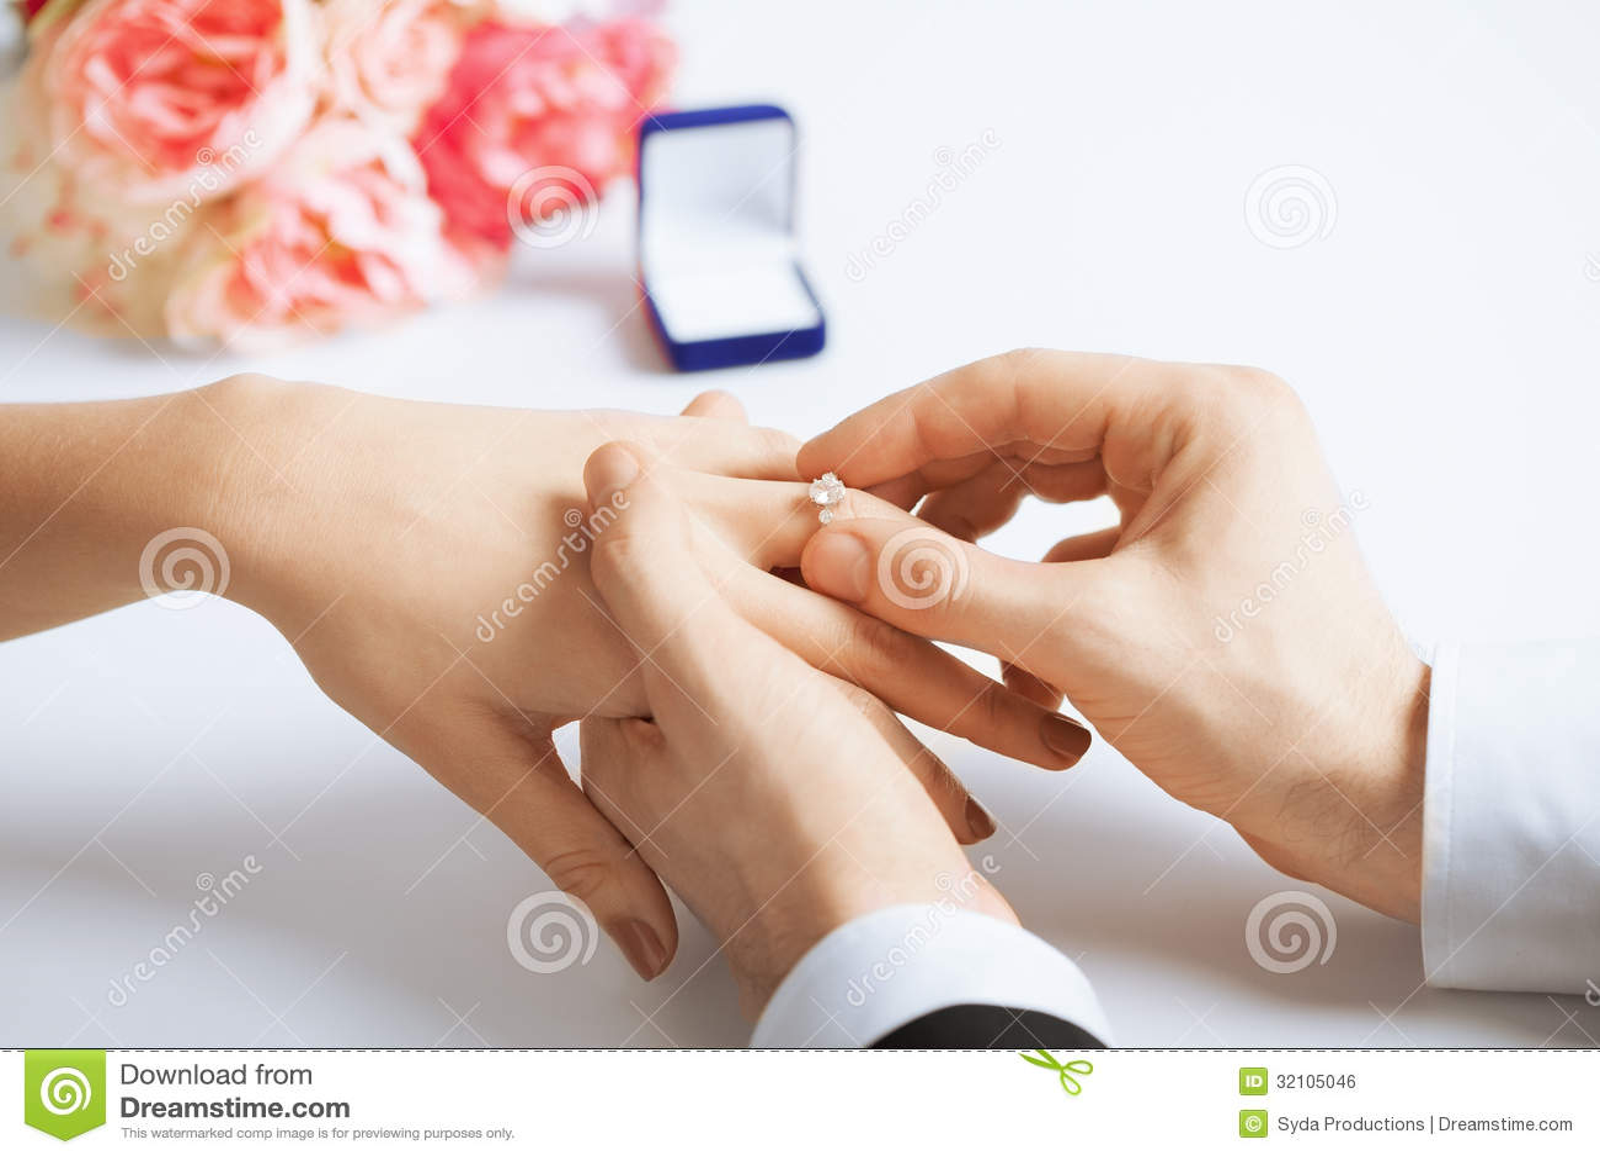 Man Putting Wedding Ring On Woman Hand Stock Photo Image of